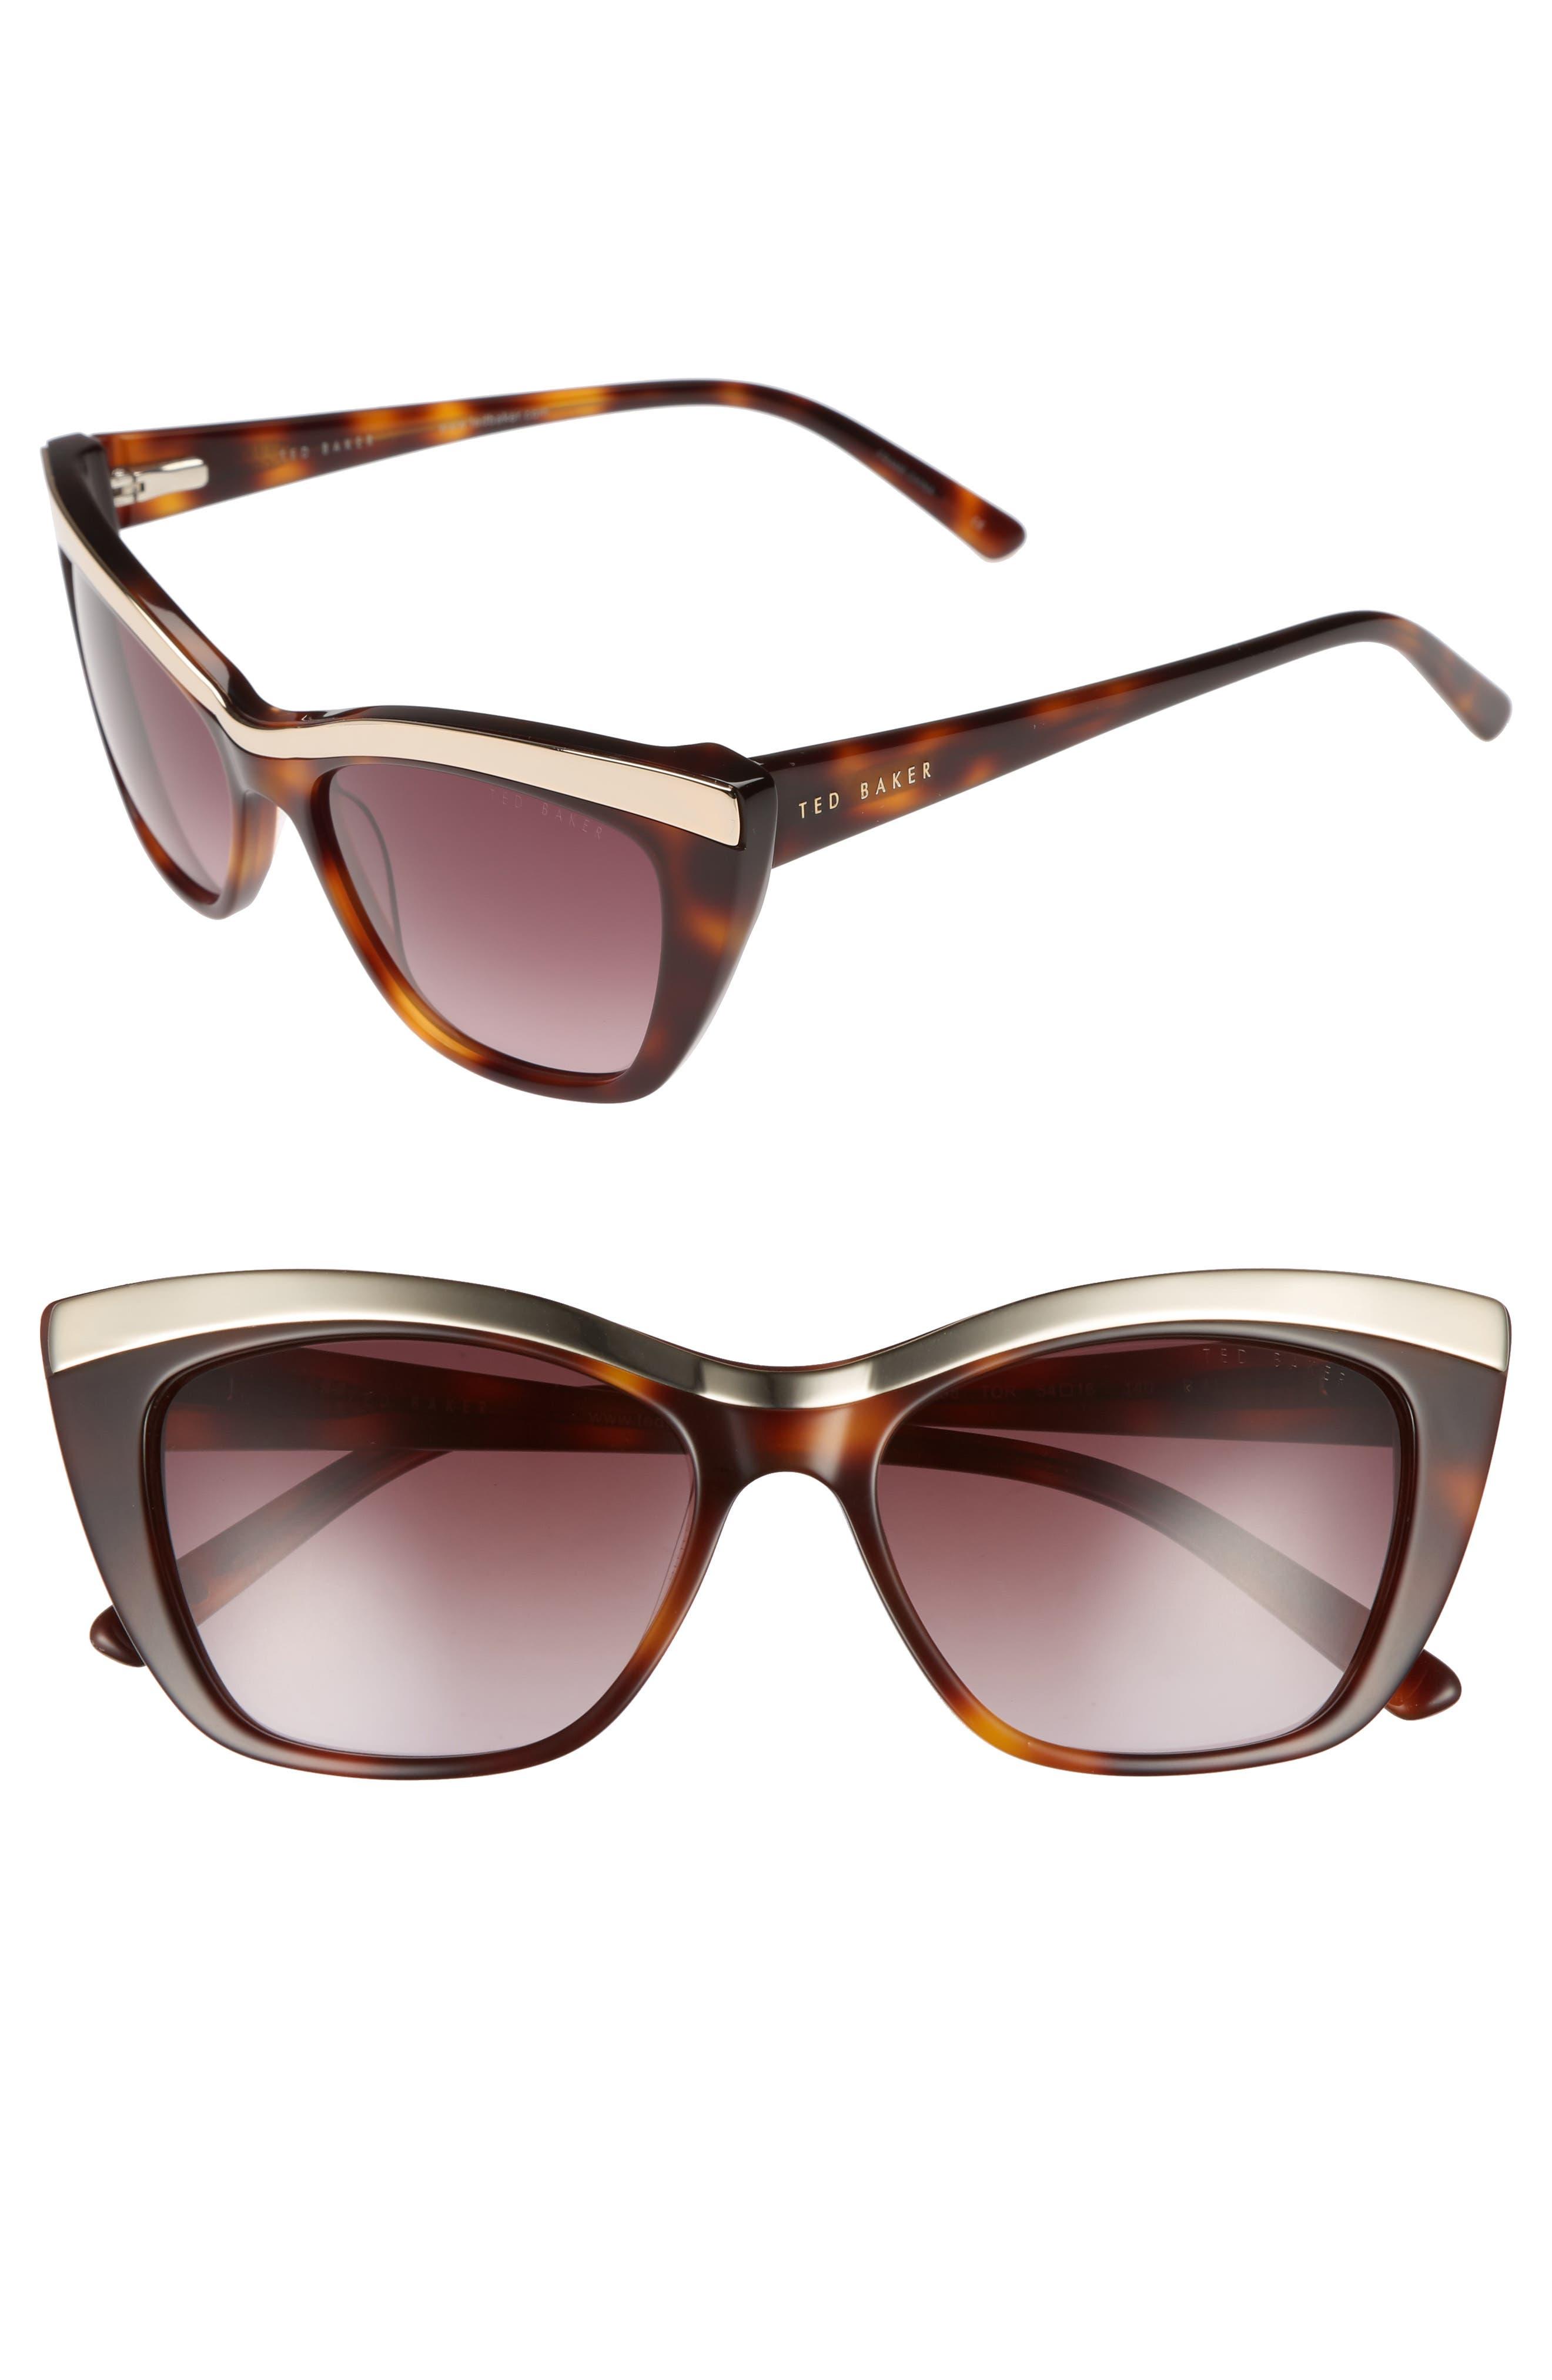 Main Image - Ted Baker London 54mm Rectangle Cat Eye Sunglasses